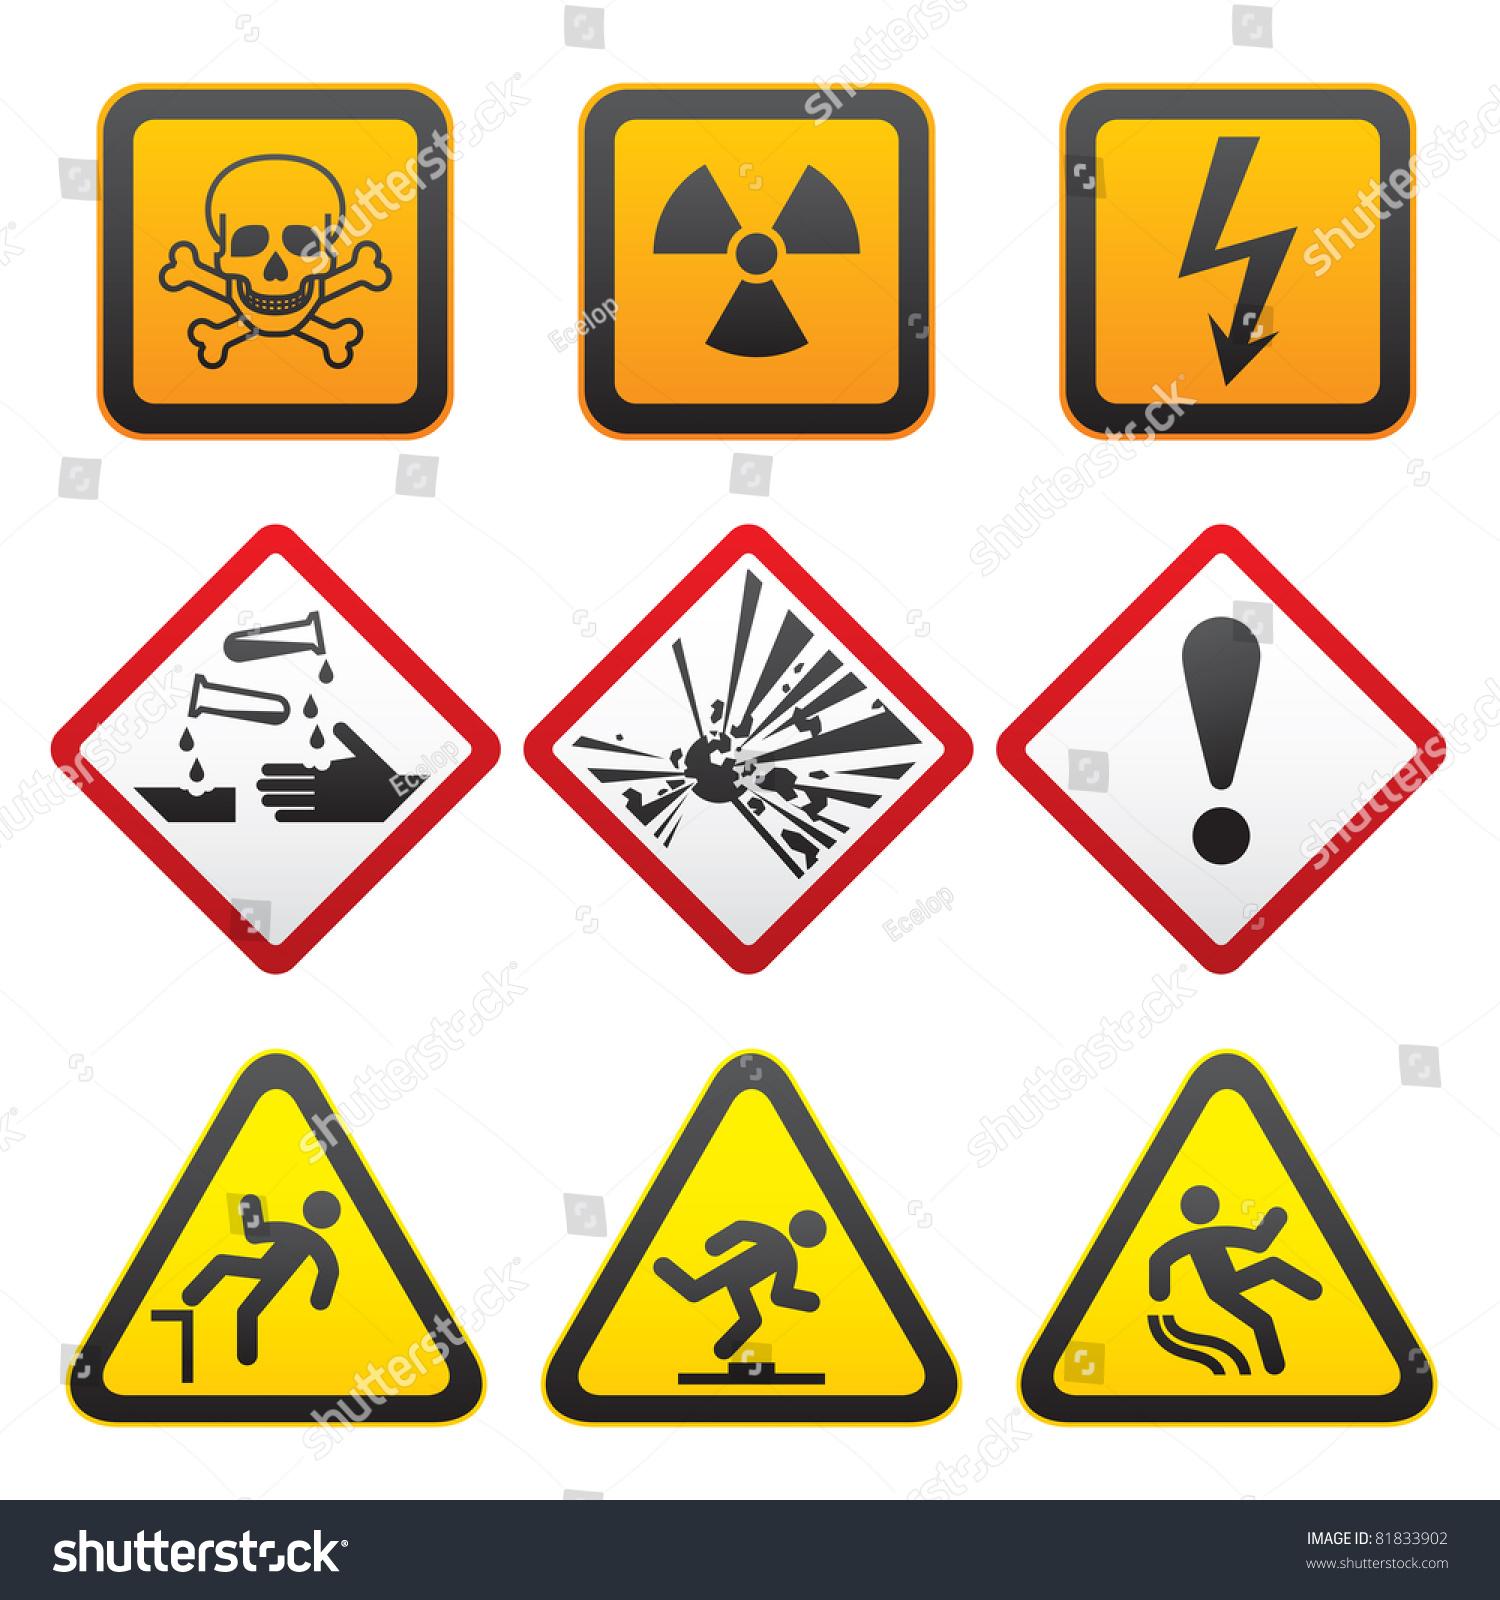 Warning symbols hazard signsfirst set bitmap stock illustration warning symbols hazard signs first set bitmap copy my id 76995334 biocorpaavc Choice Image